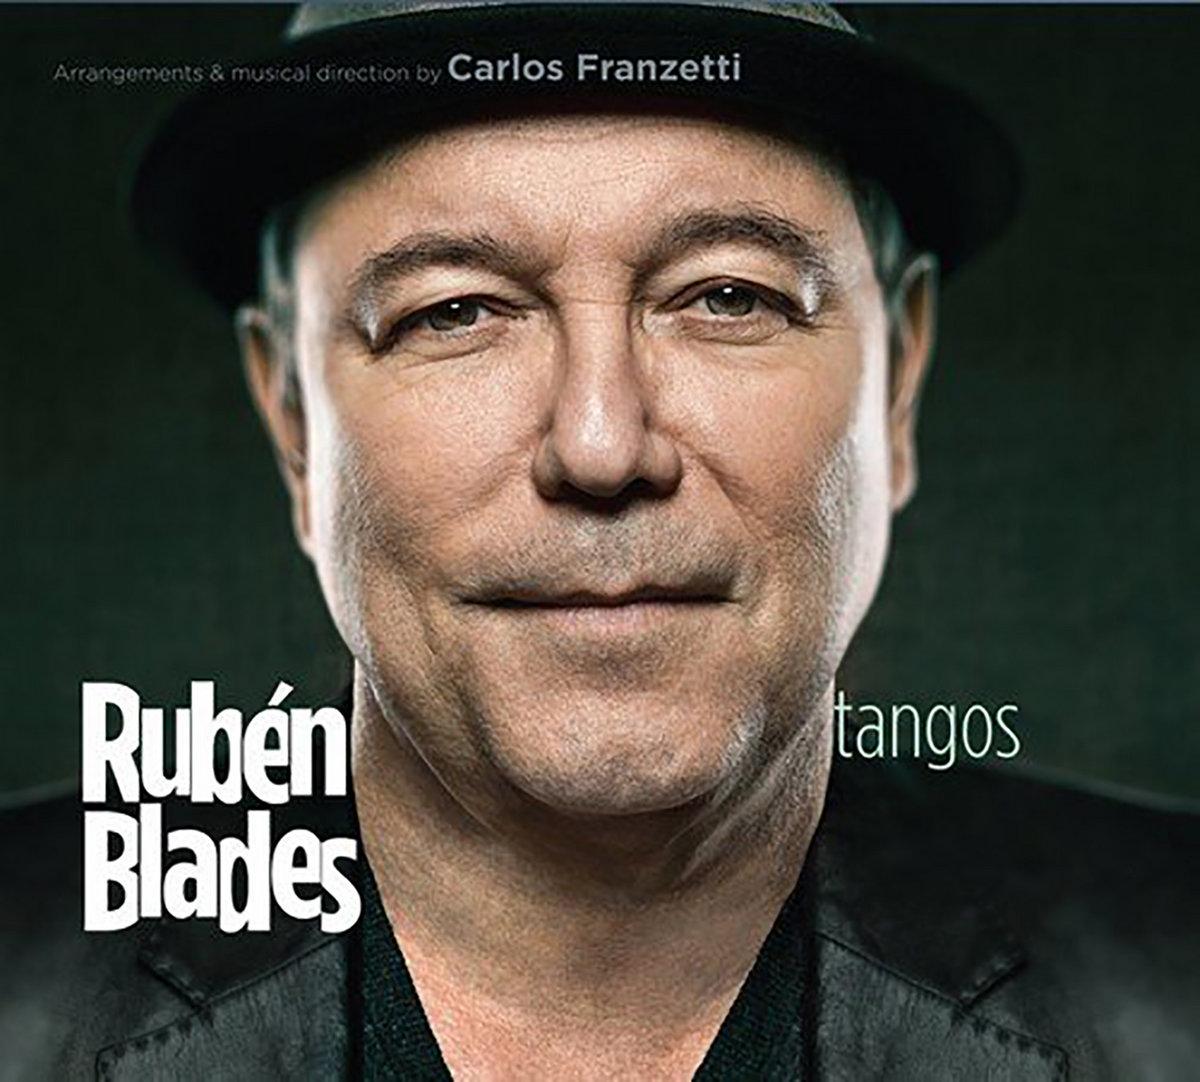 Pedro navaja by ruben blades / willie colon on amazon music.